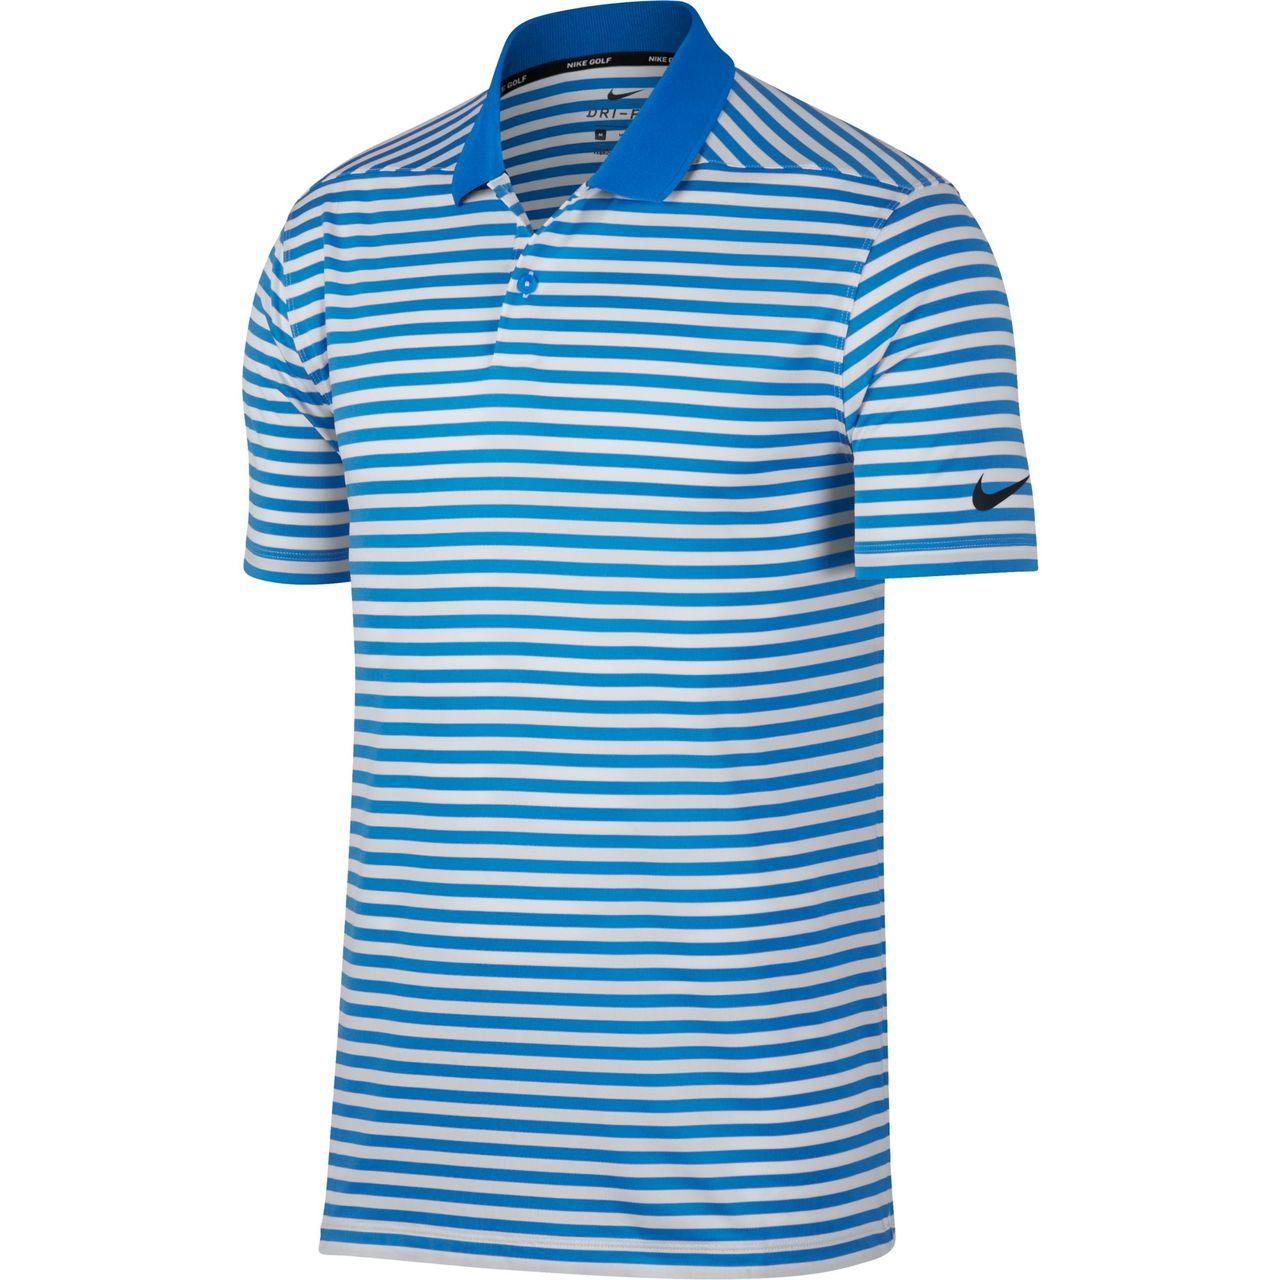 459c11d130e05 Shop Nike Dry Victory Stripe Men's Golf Polo | GLW